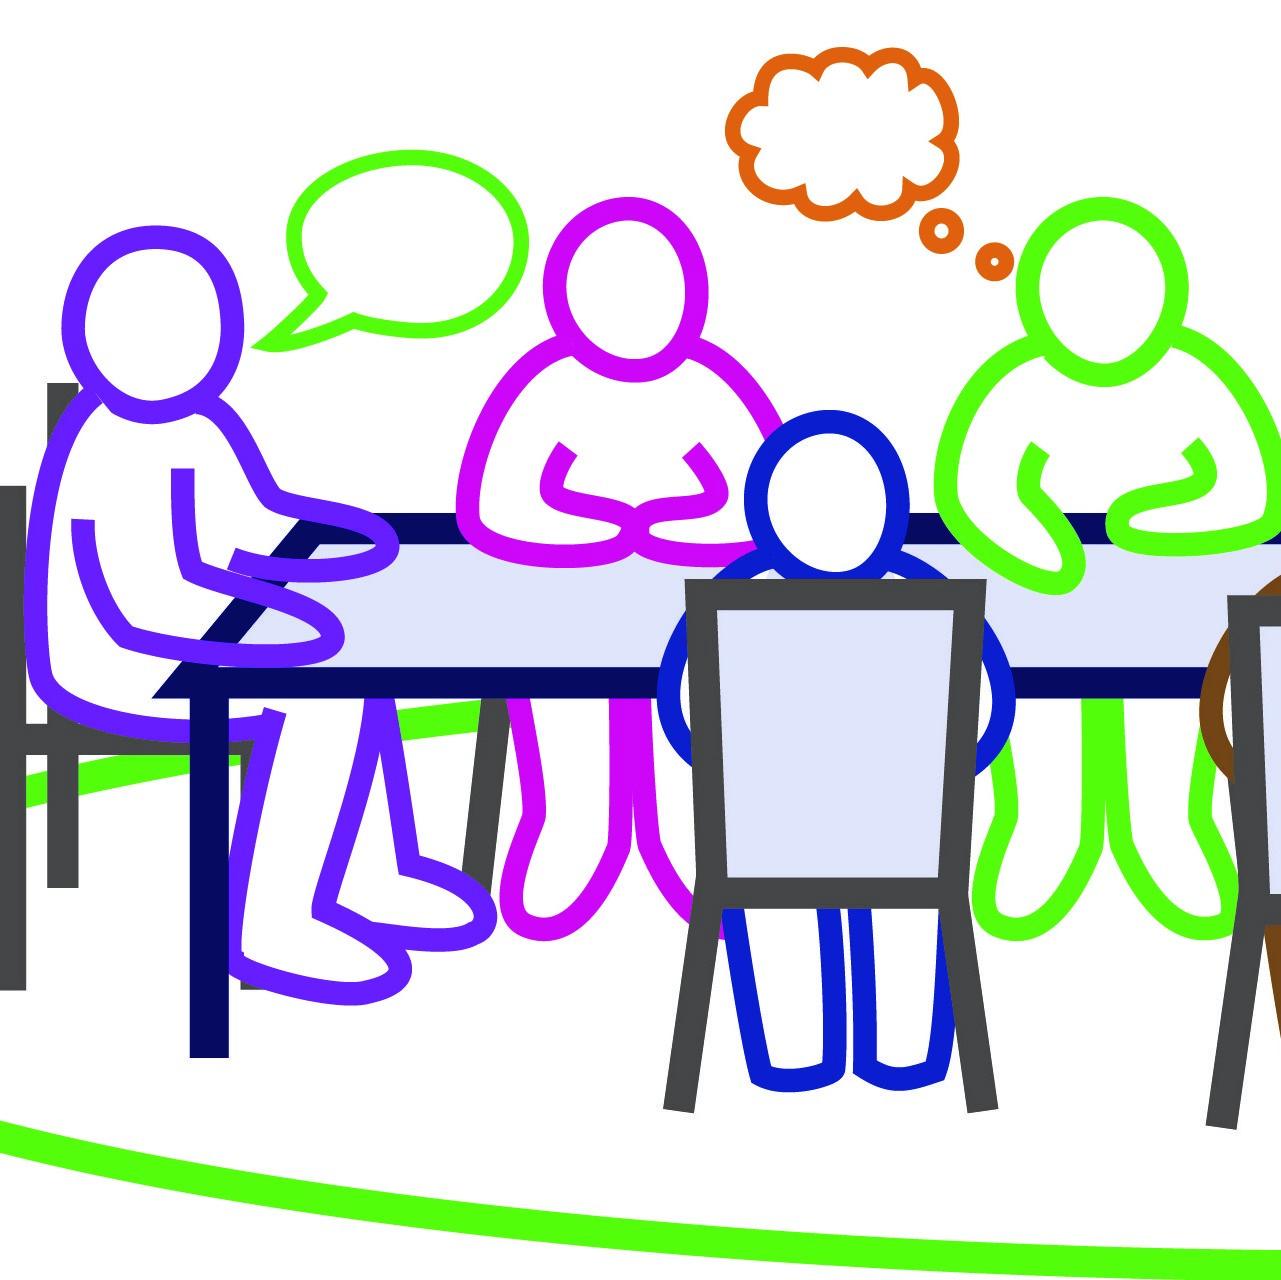 Resident council meeting clipart 6 » Clipart Portal.